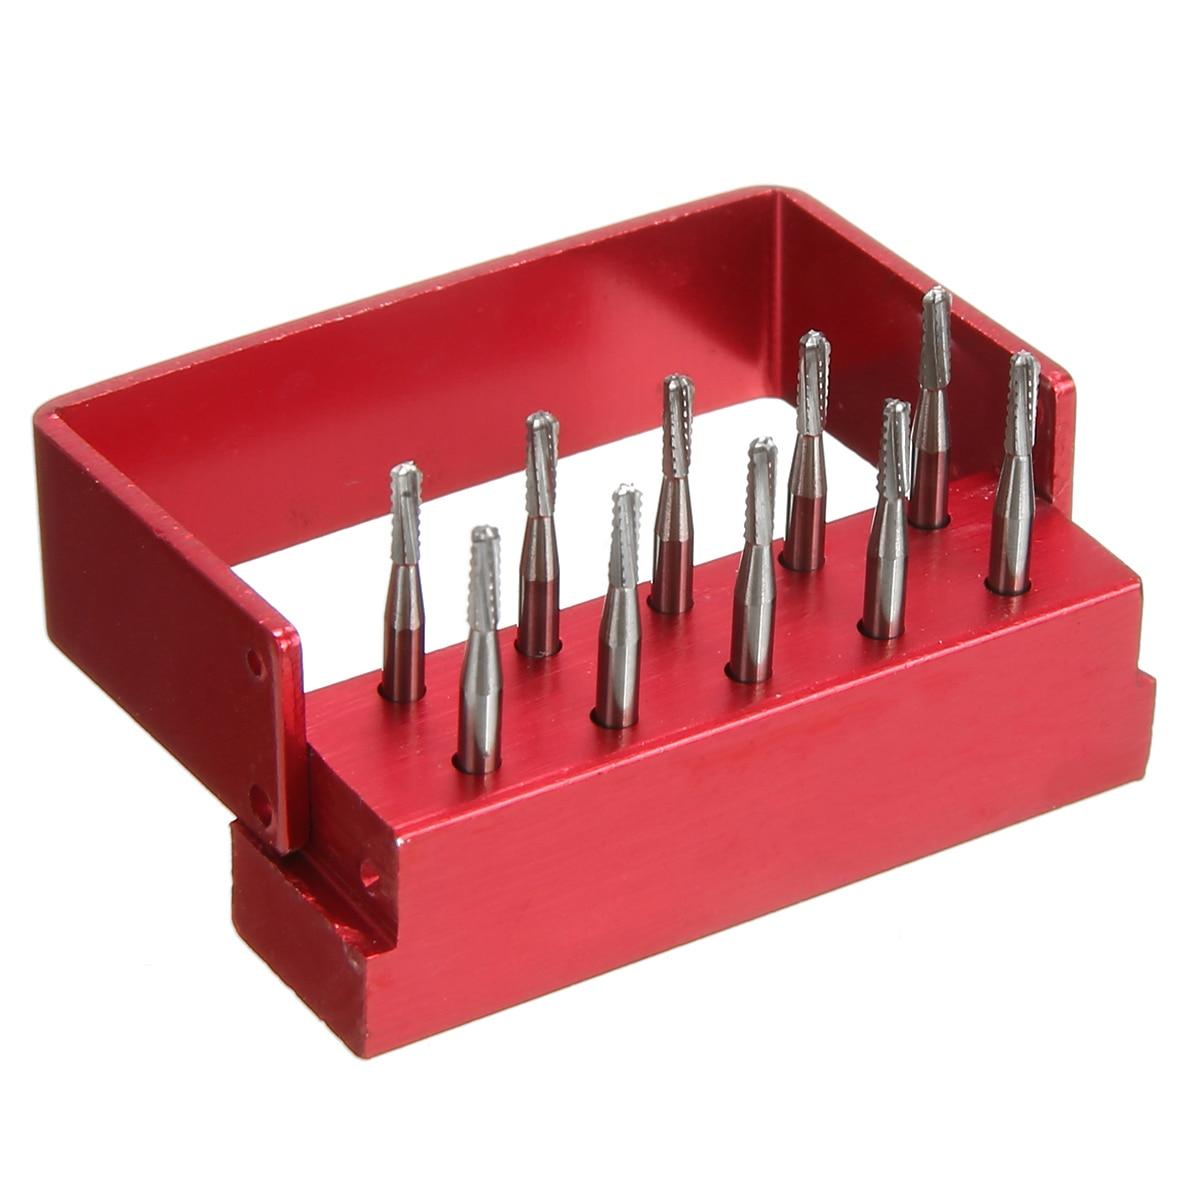 10pcs Tungsten Steel Drill Polisher Dental Polishing Burs Rotary Tool Set Teeth Whitening Dentist Equipment